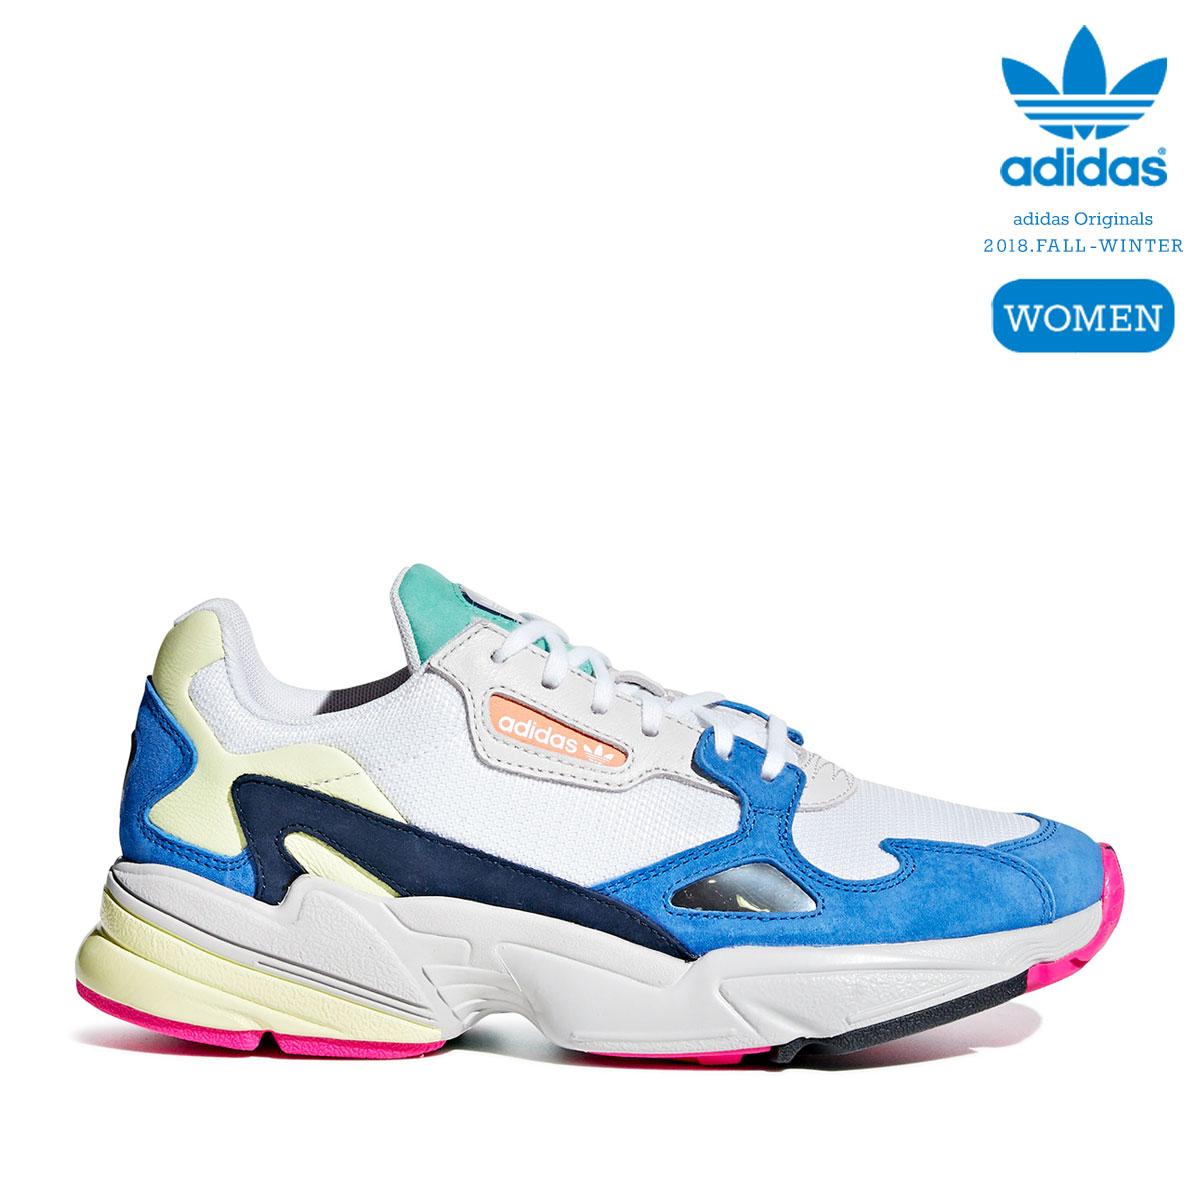 d65b5e995741dd Kinetics  adidas Originals ADIDASFALCON W (Running White Running  White Blue)